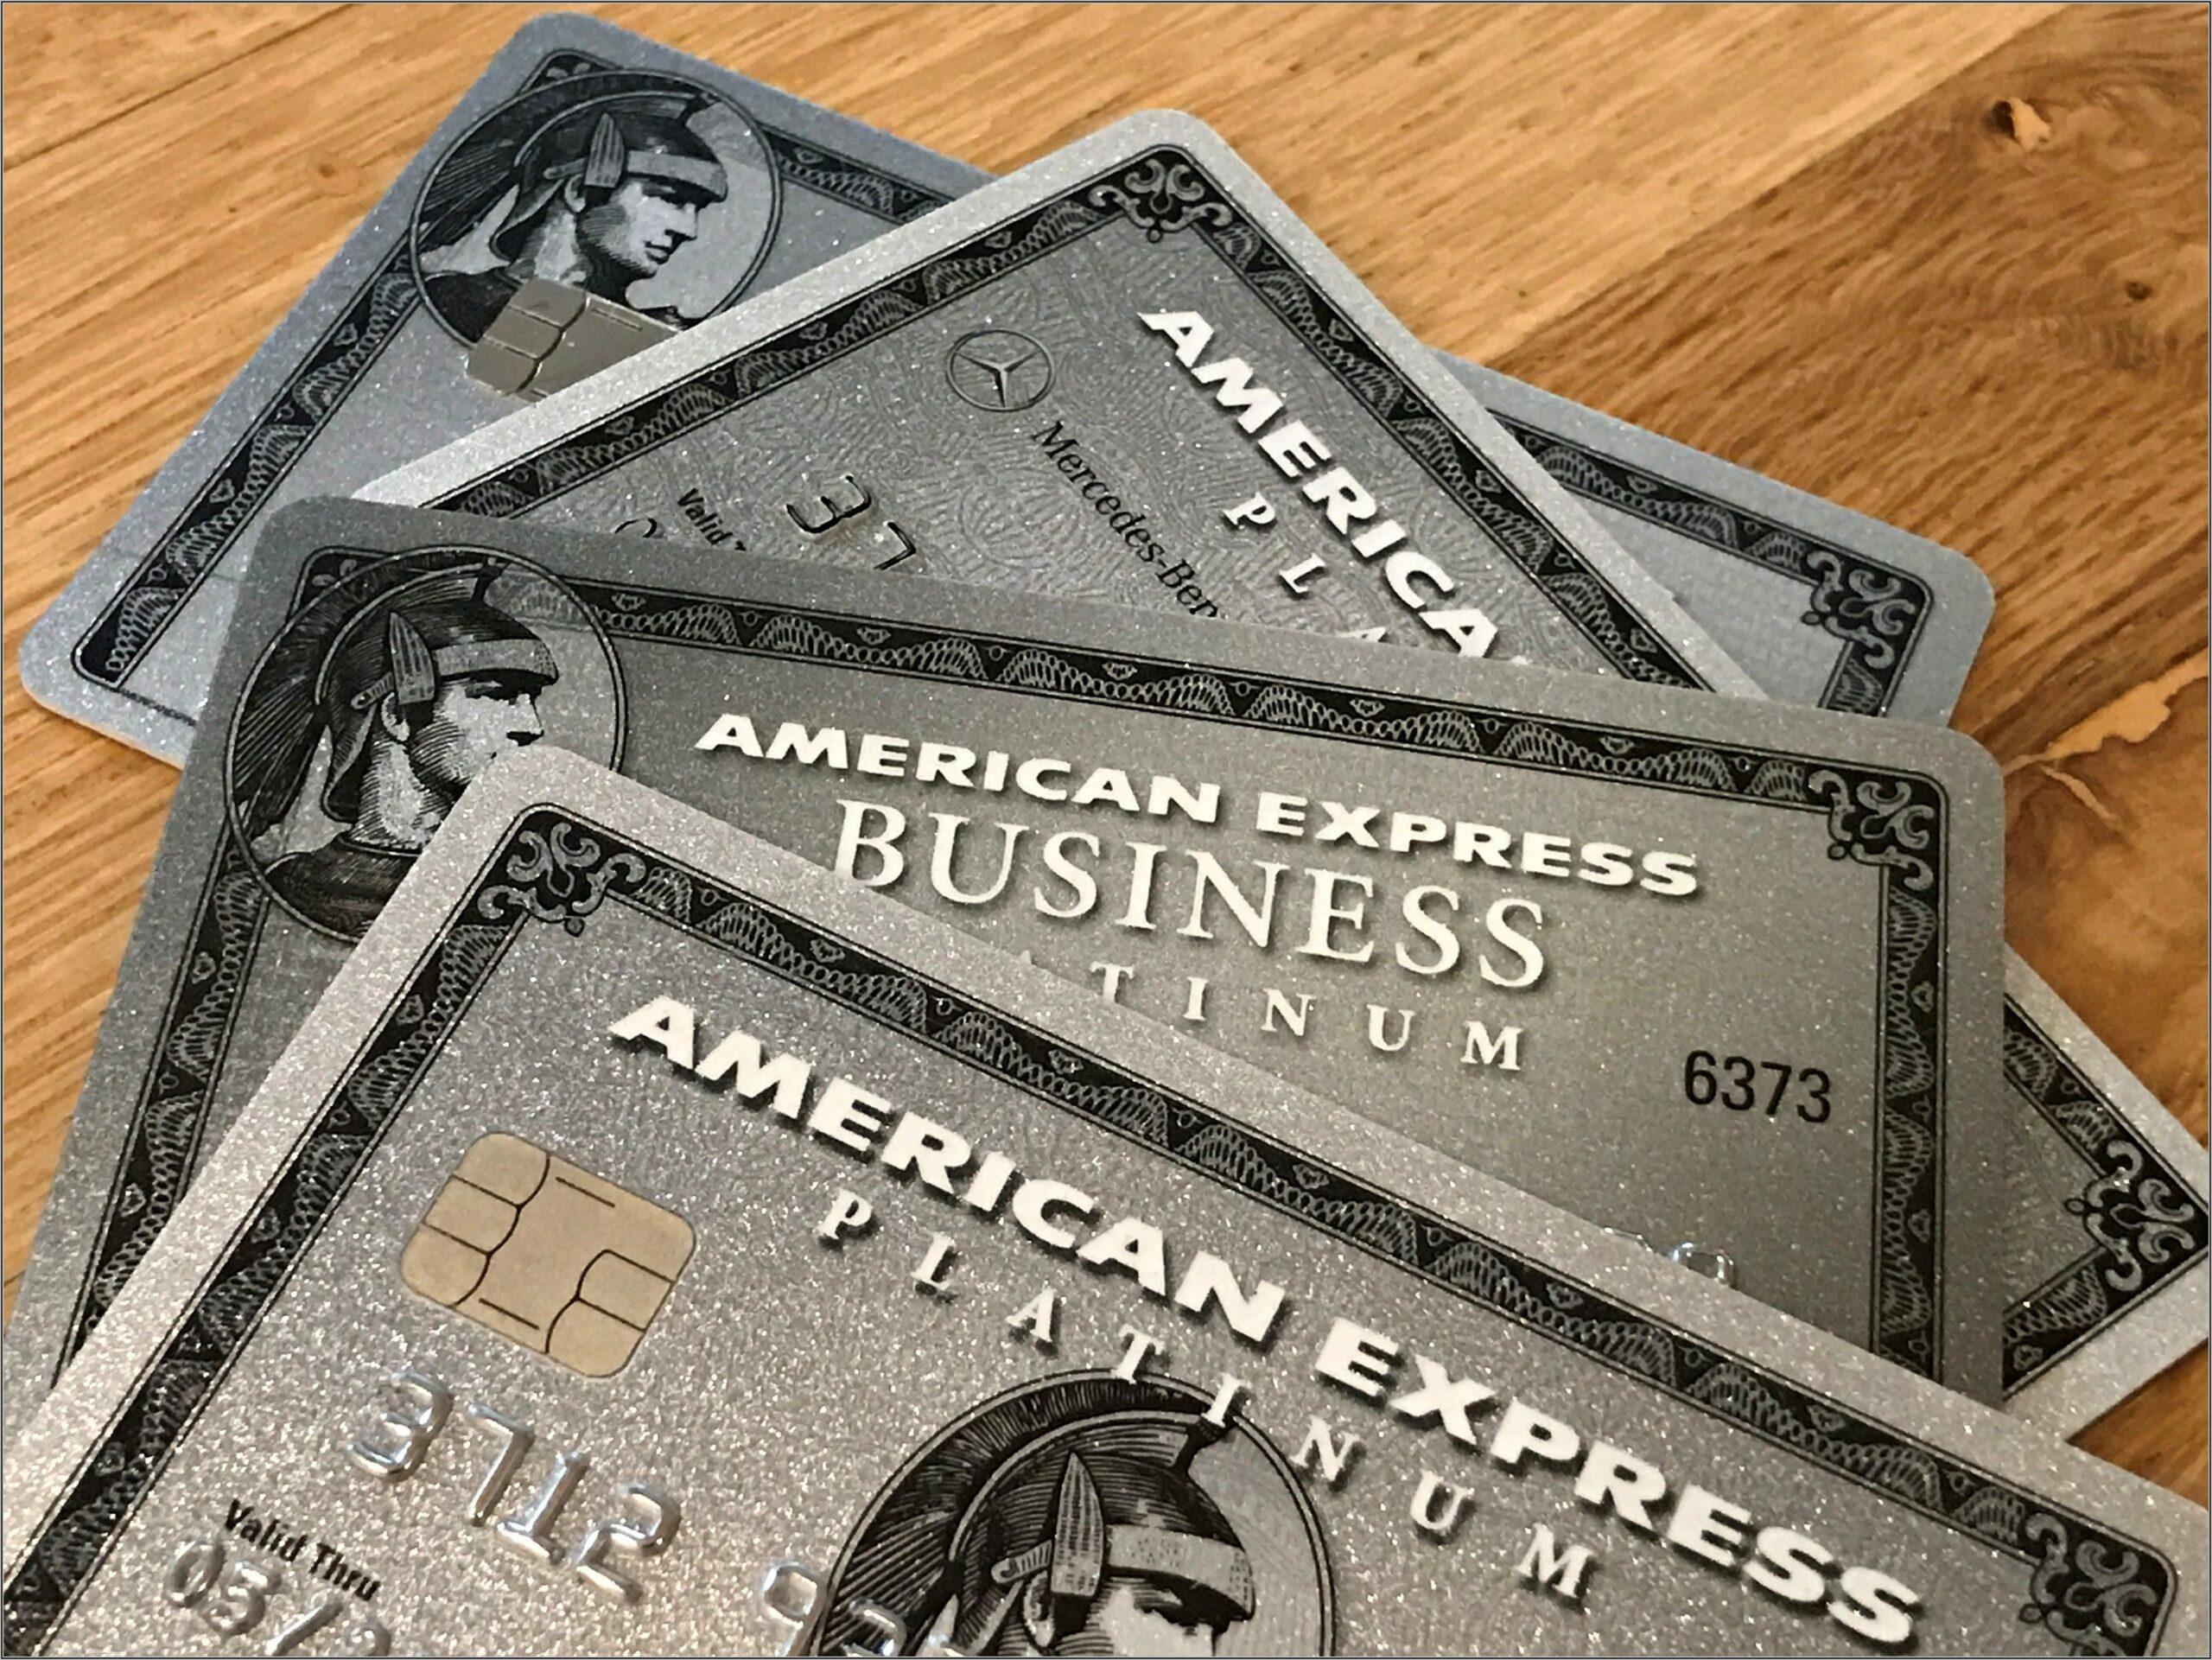 Amex Business Platinum Employee Card Benefits